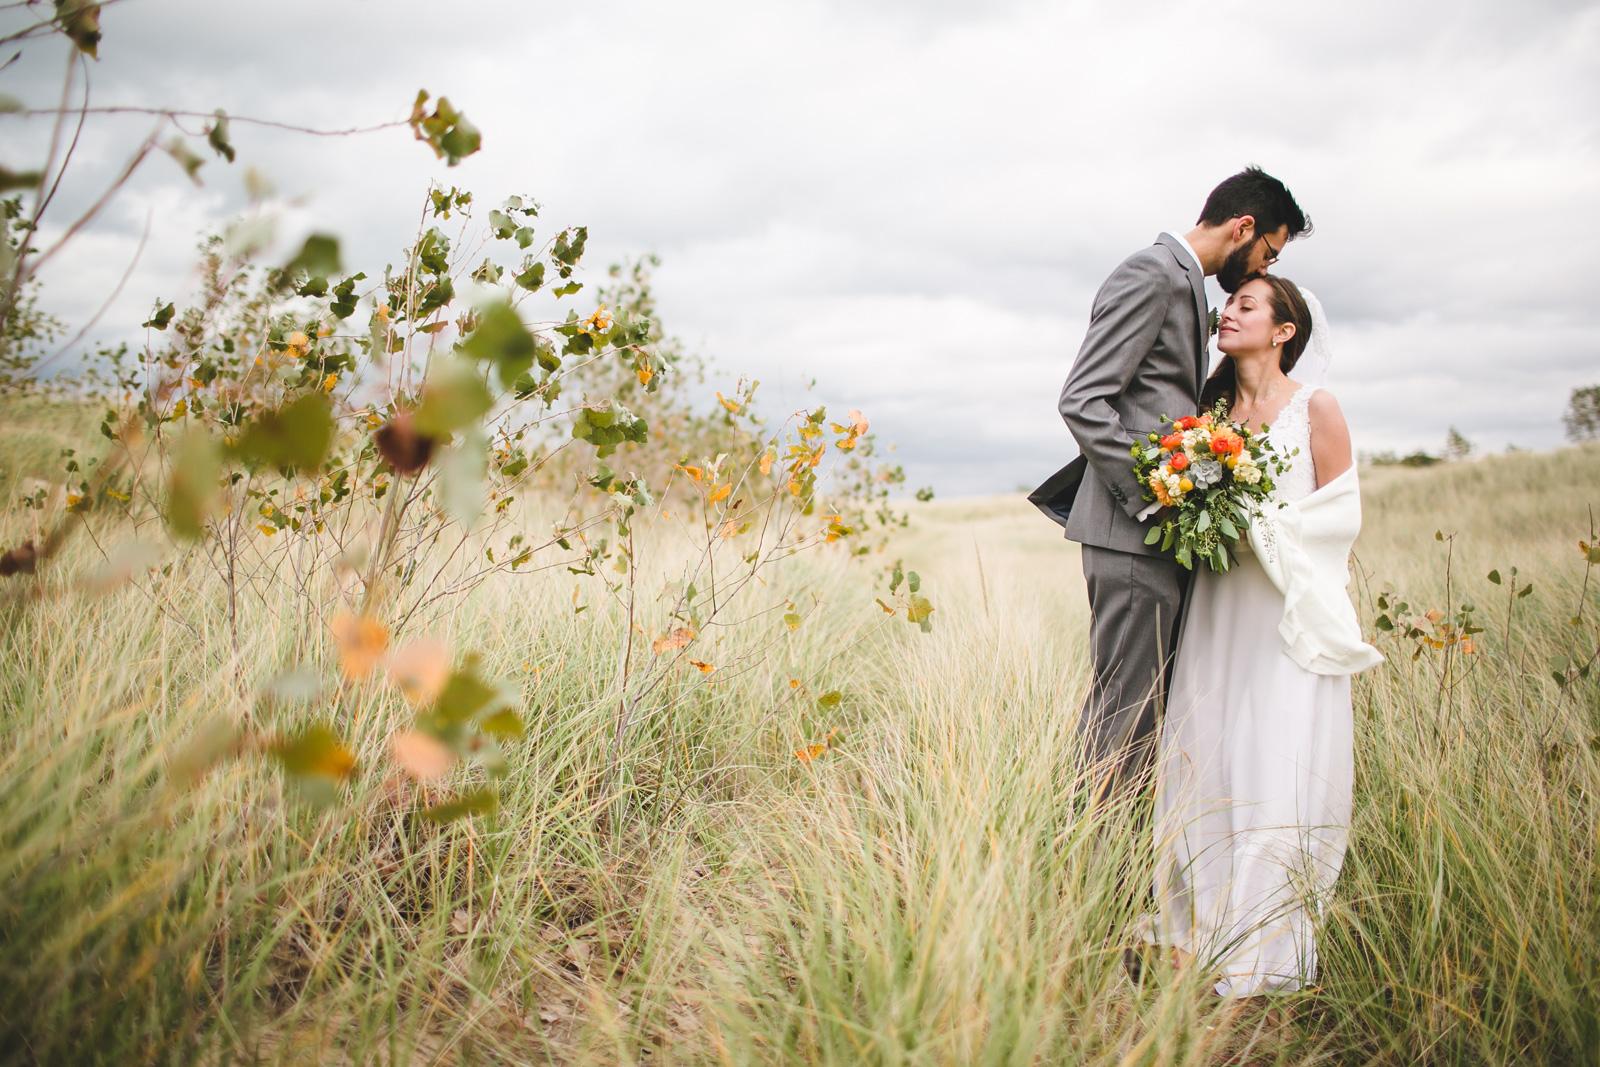 Documentary Wedding Photographer Chicago - Mark Trela Photography